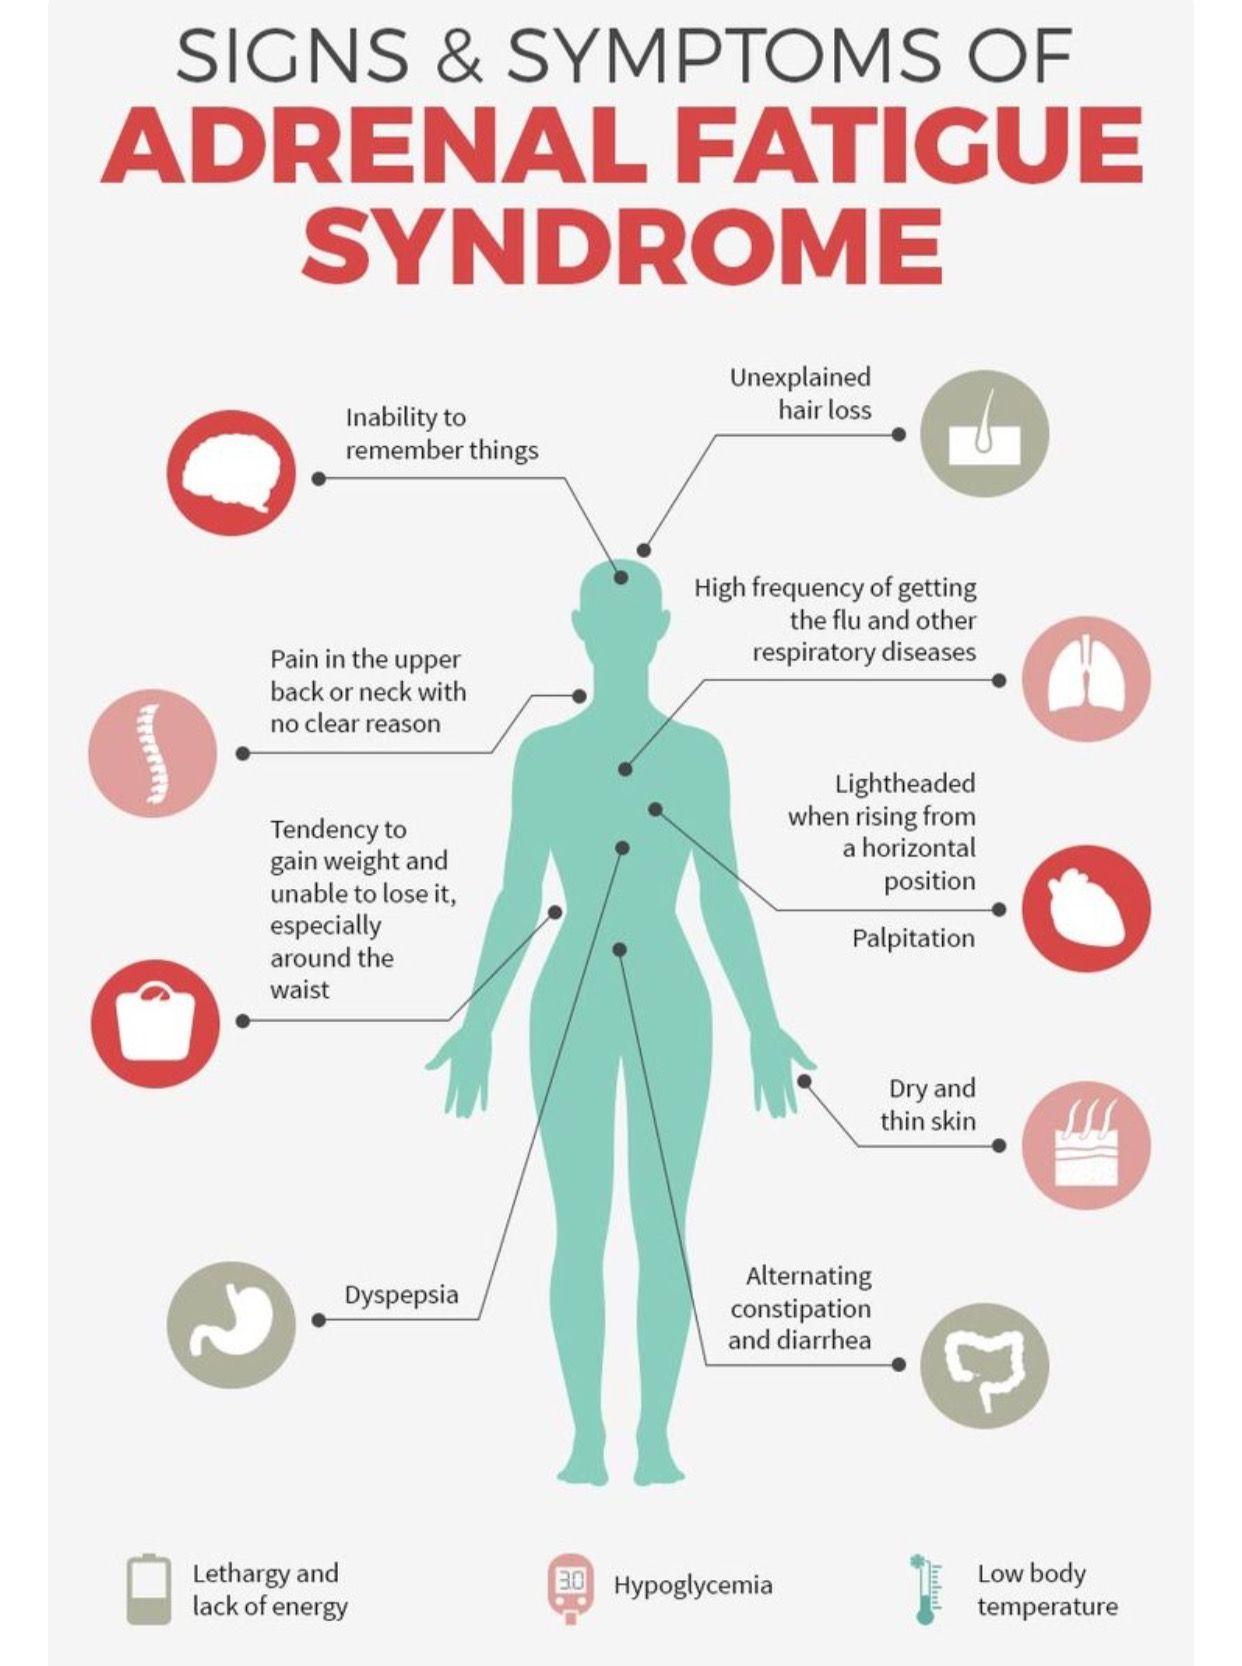 Symptoms of adrenal fatigue syndrome